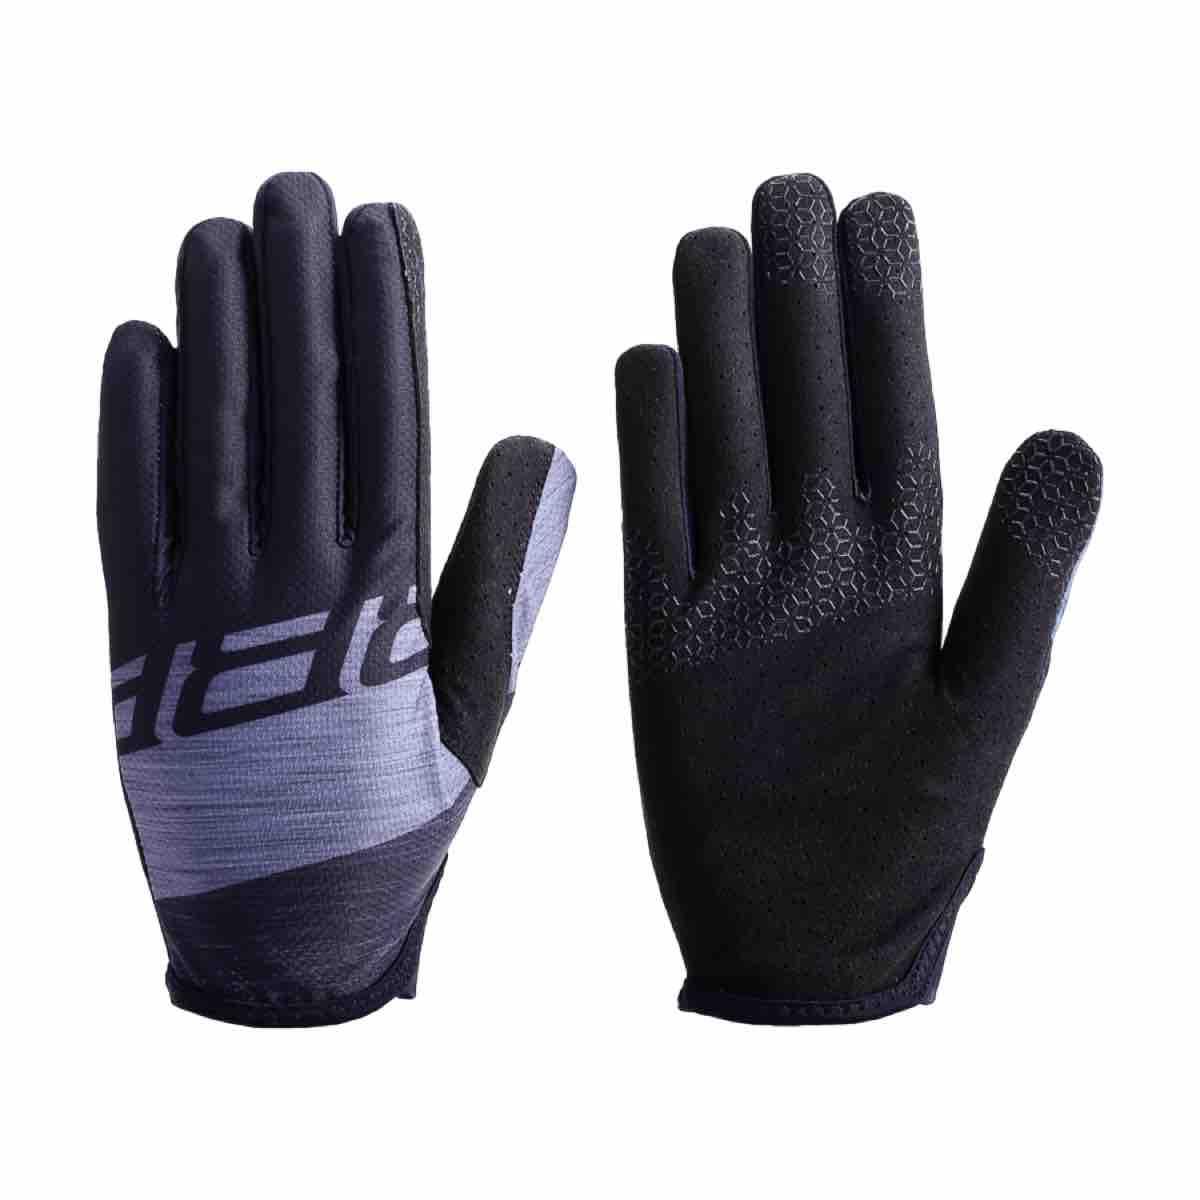 BBB Handske LiteZone MTB/Race Sort/Grå lang - BBW-54 - B7-9541x | Gloves